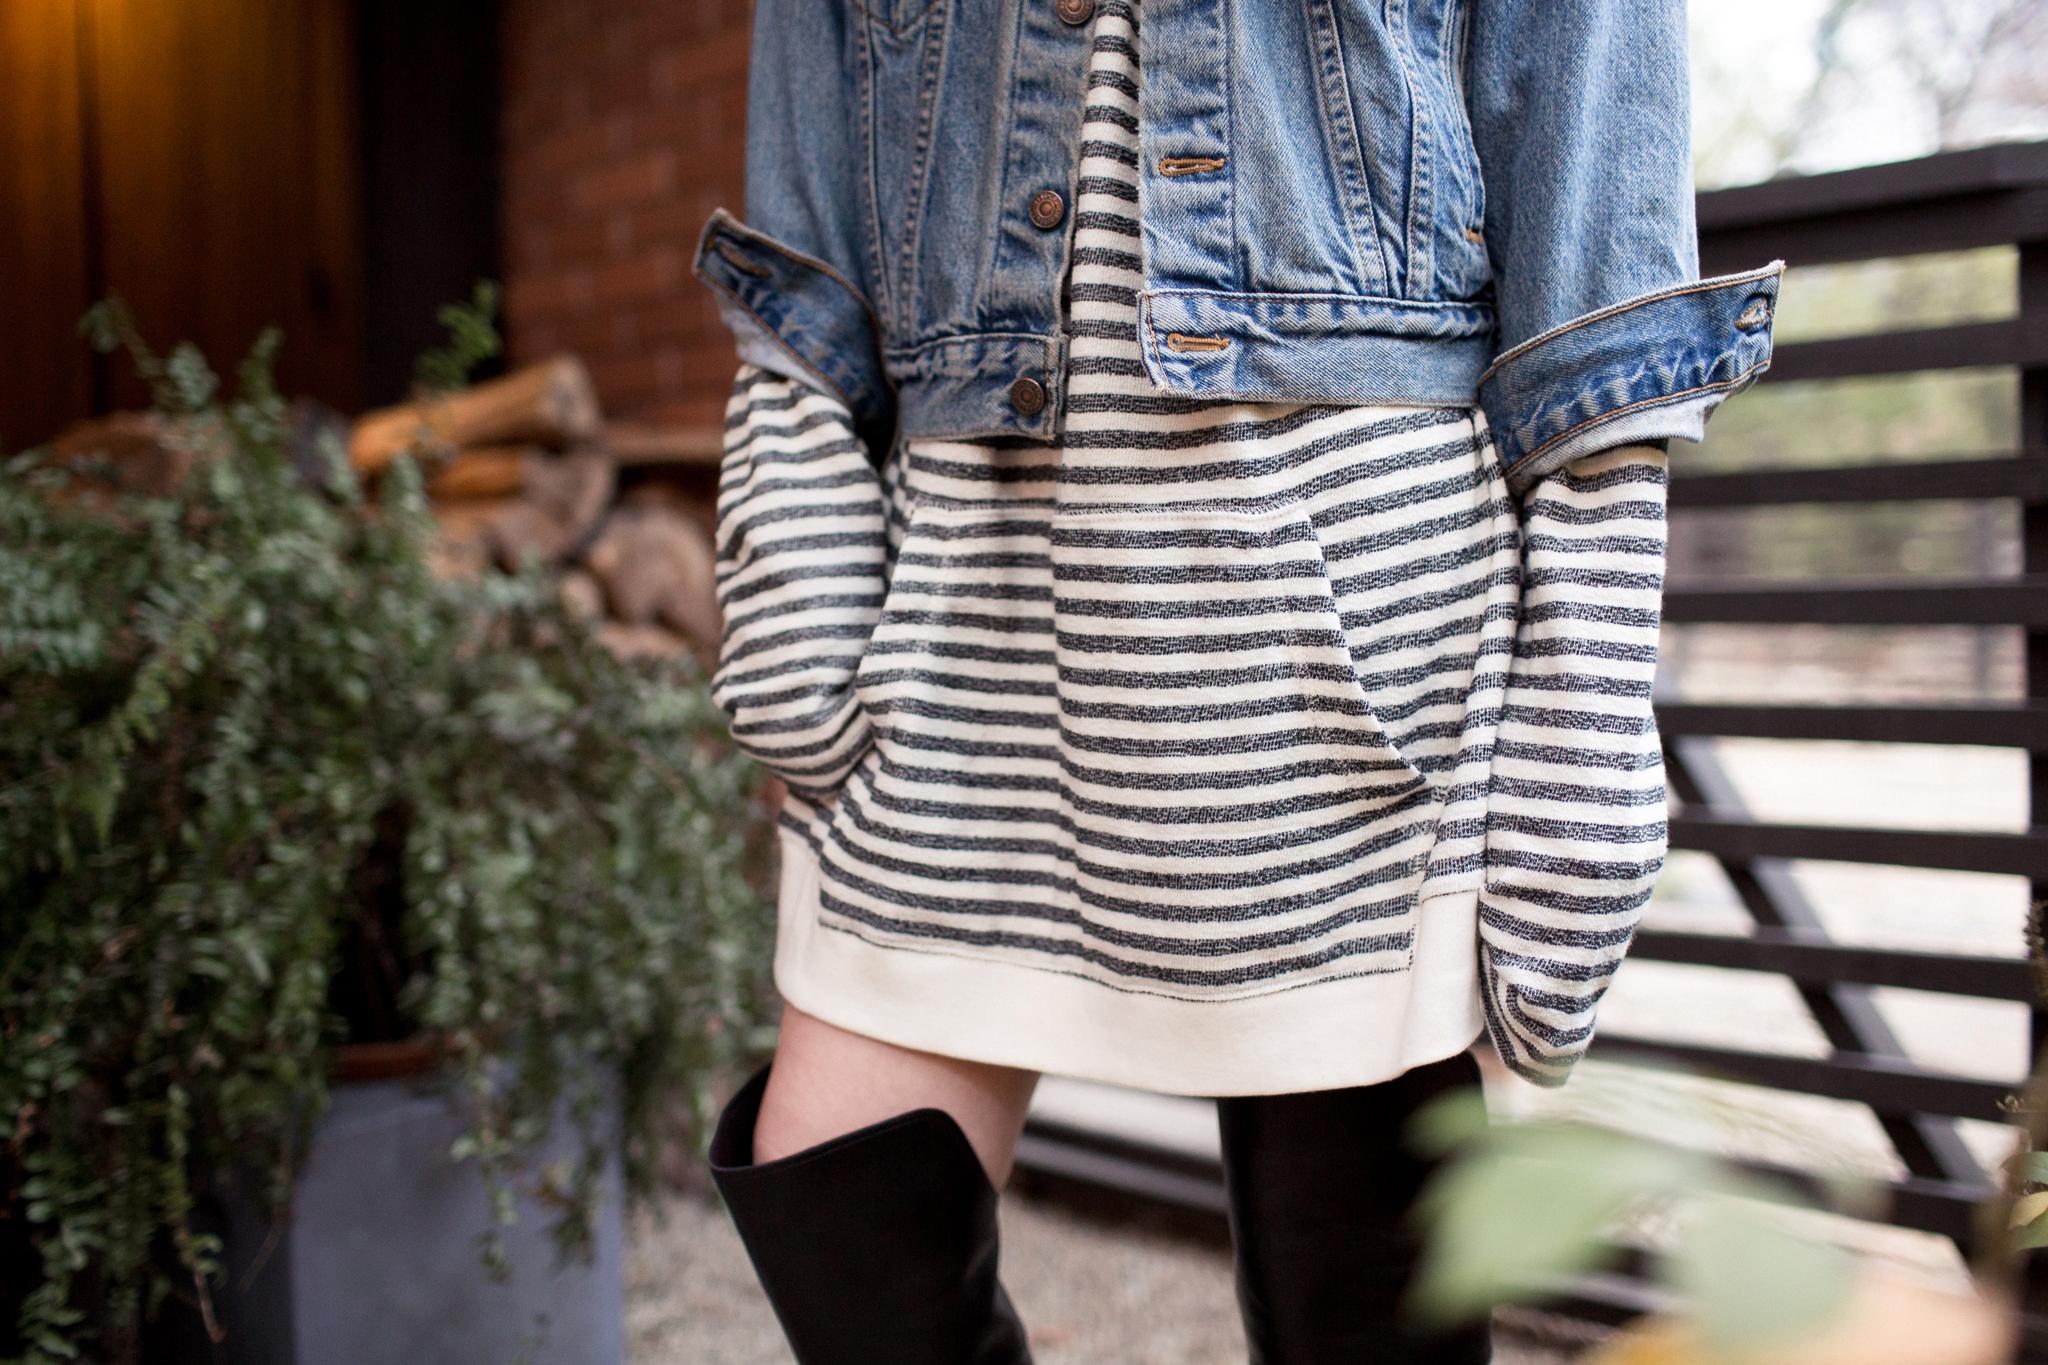 Eldridge Edit-Anna_Cottrell_Fashion_Blogger_Winter_2017_Jean_Denim_Jacket_Patches_Striped_Oversized_Hoodie_Ralph_Lauren_Black_Over_the_Knee_OTK_Boots_MGB_Photo_3.jpg